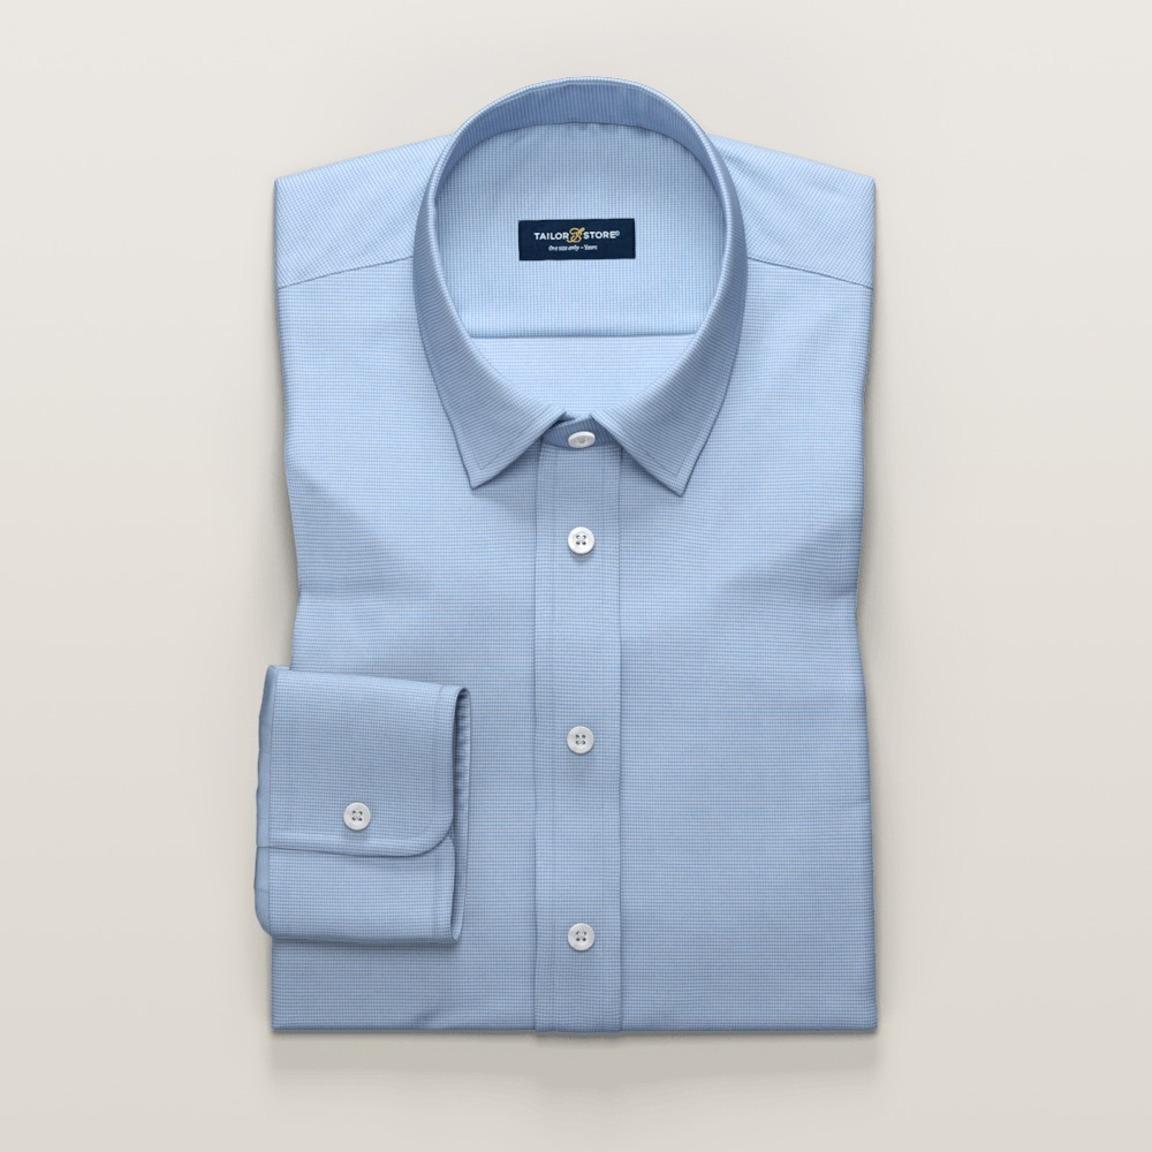 Hellblaues Damenhemd